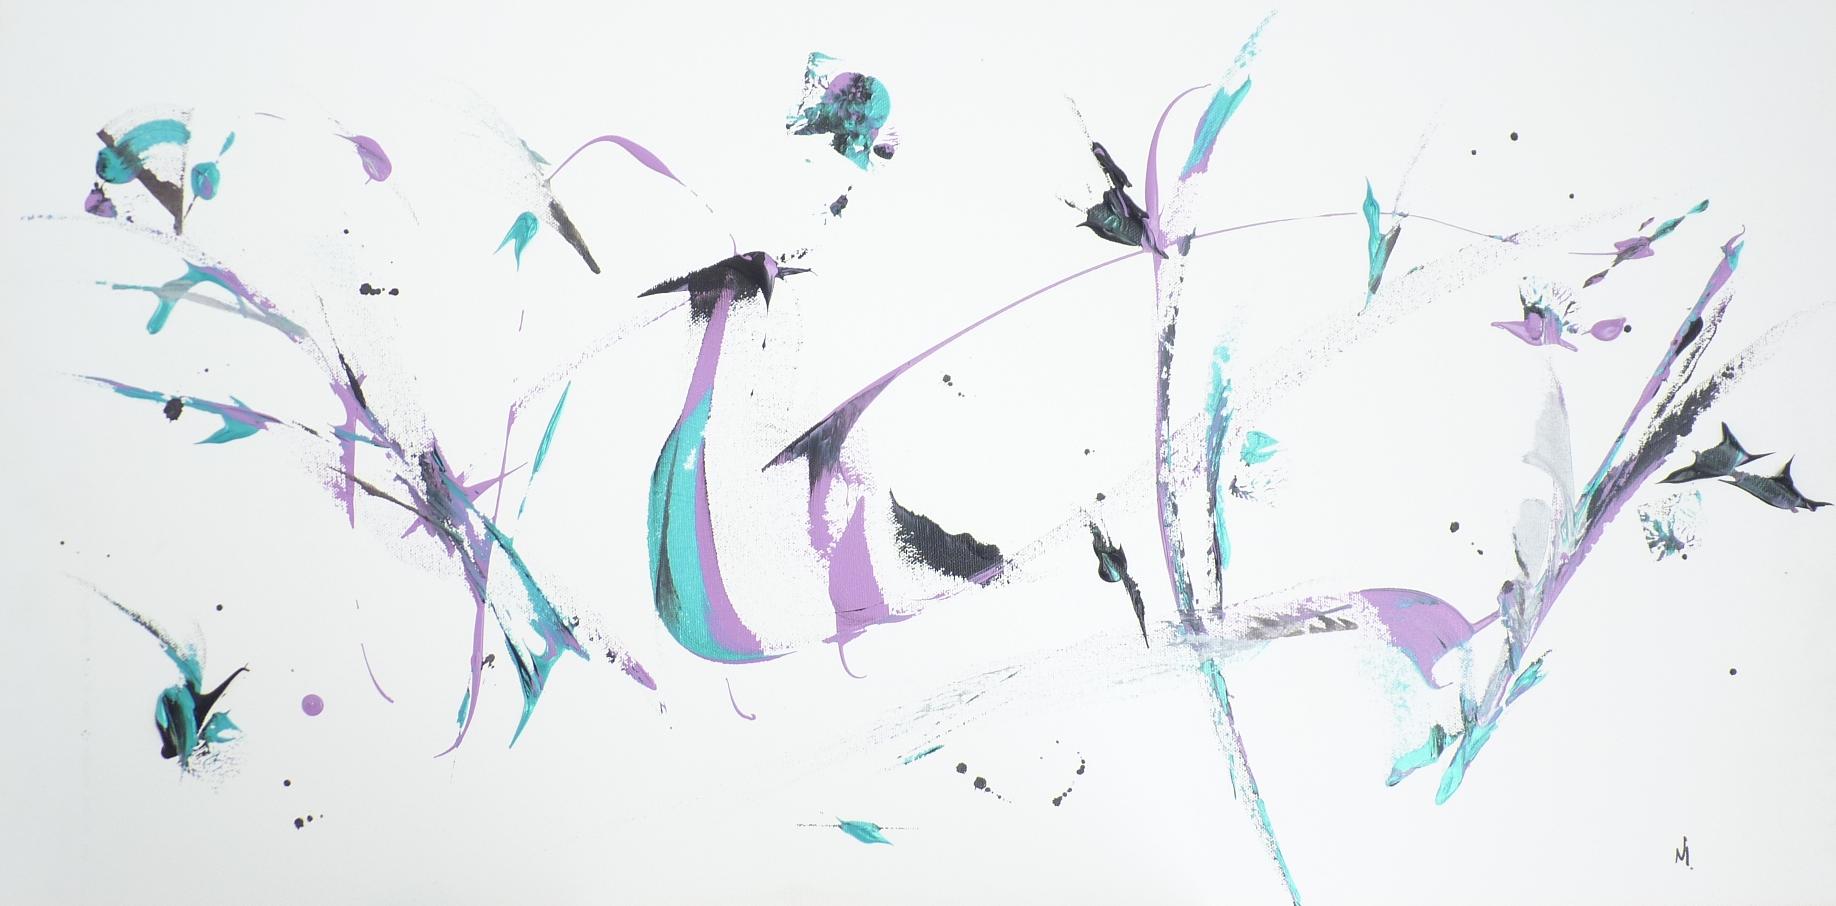 Peinture sur toile (TO-01)